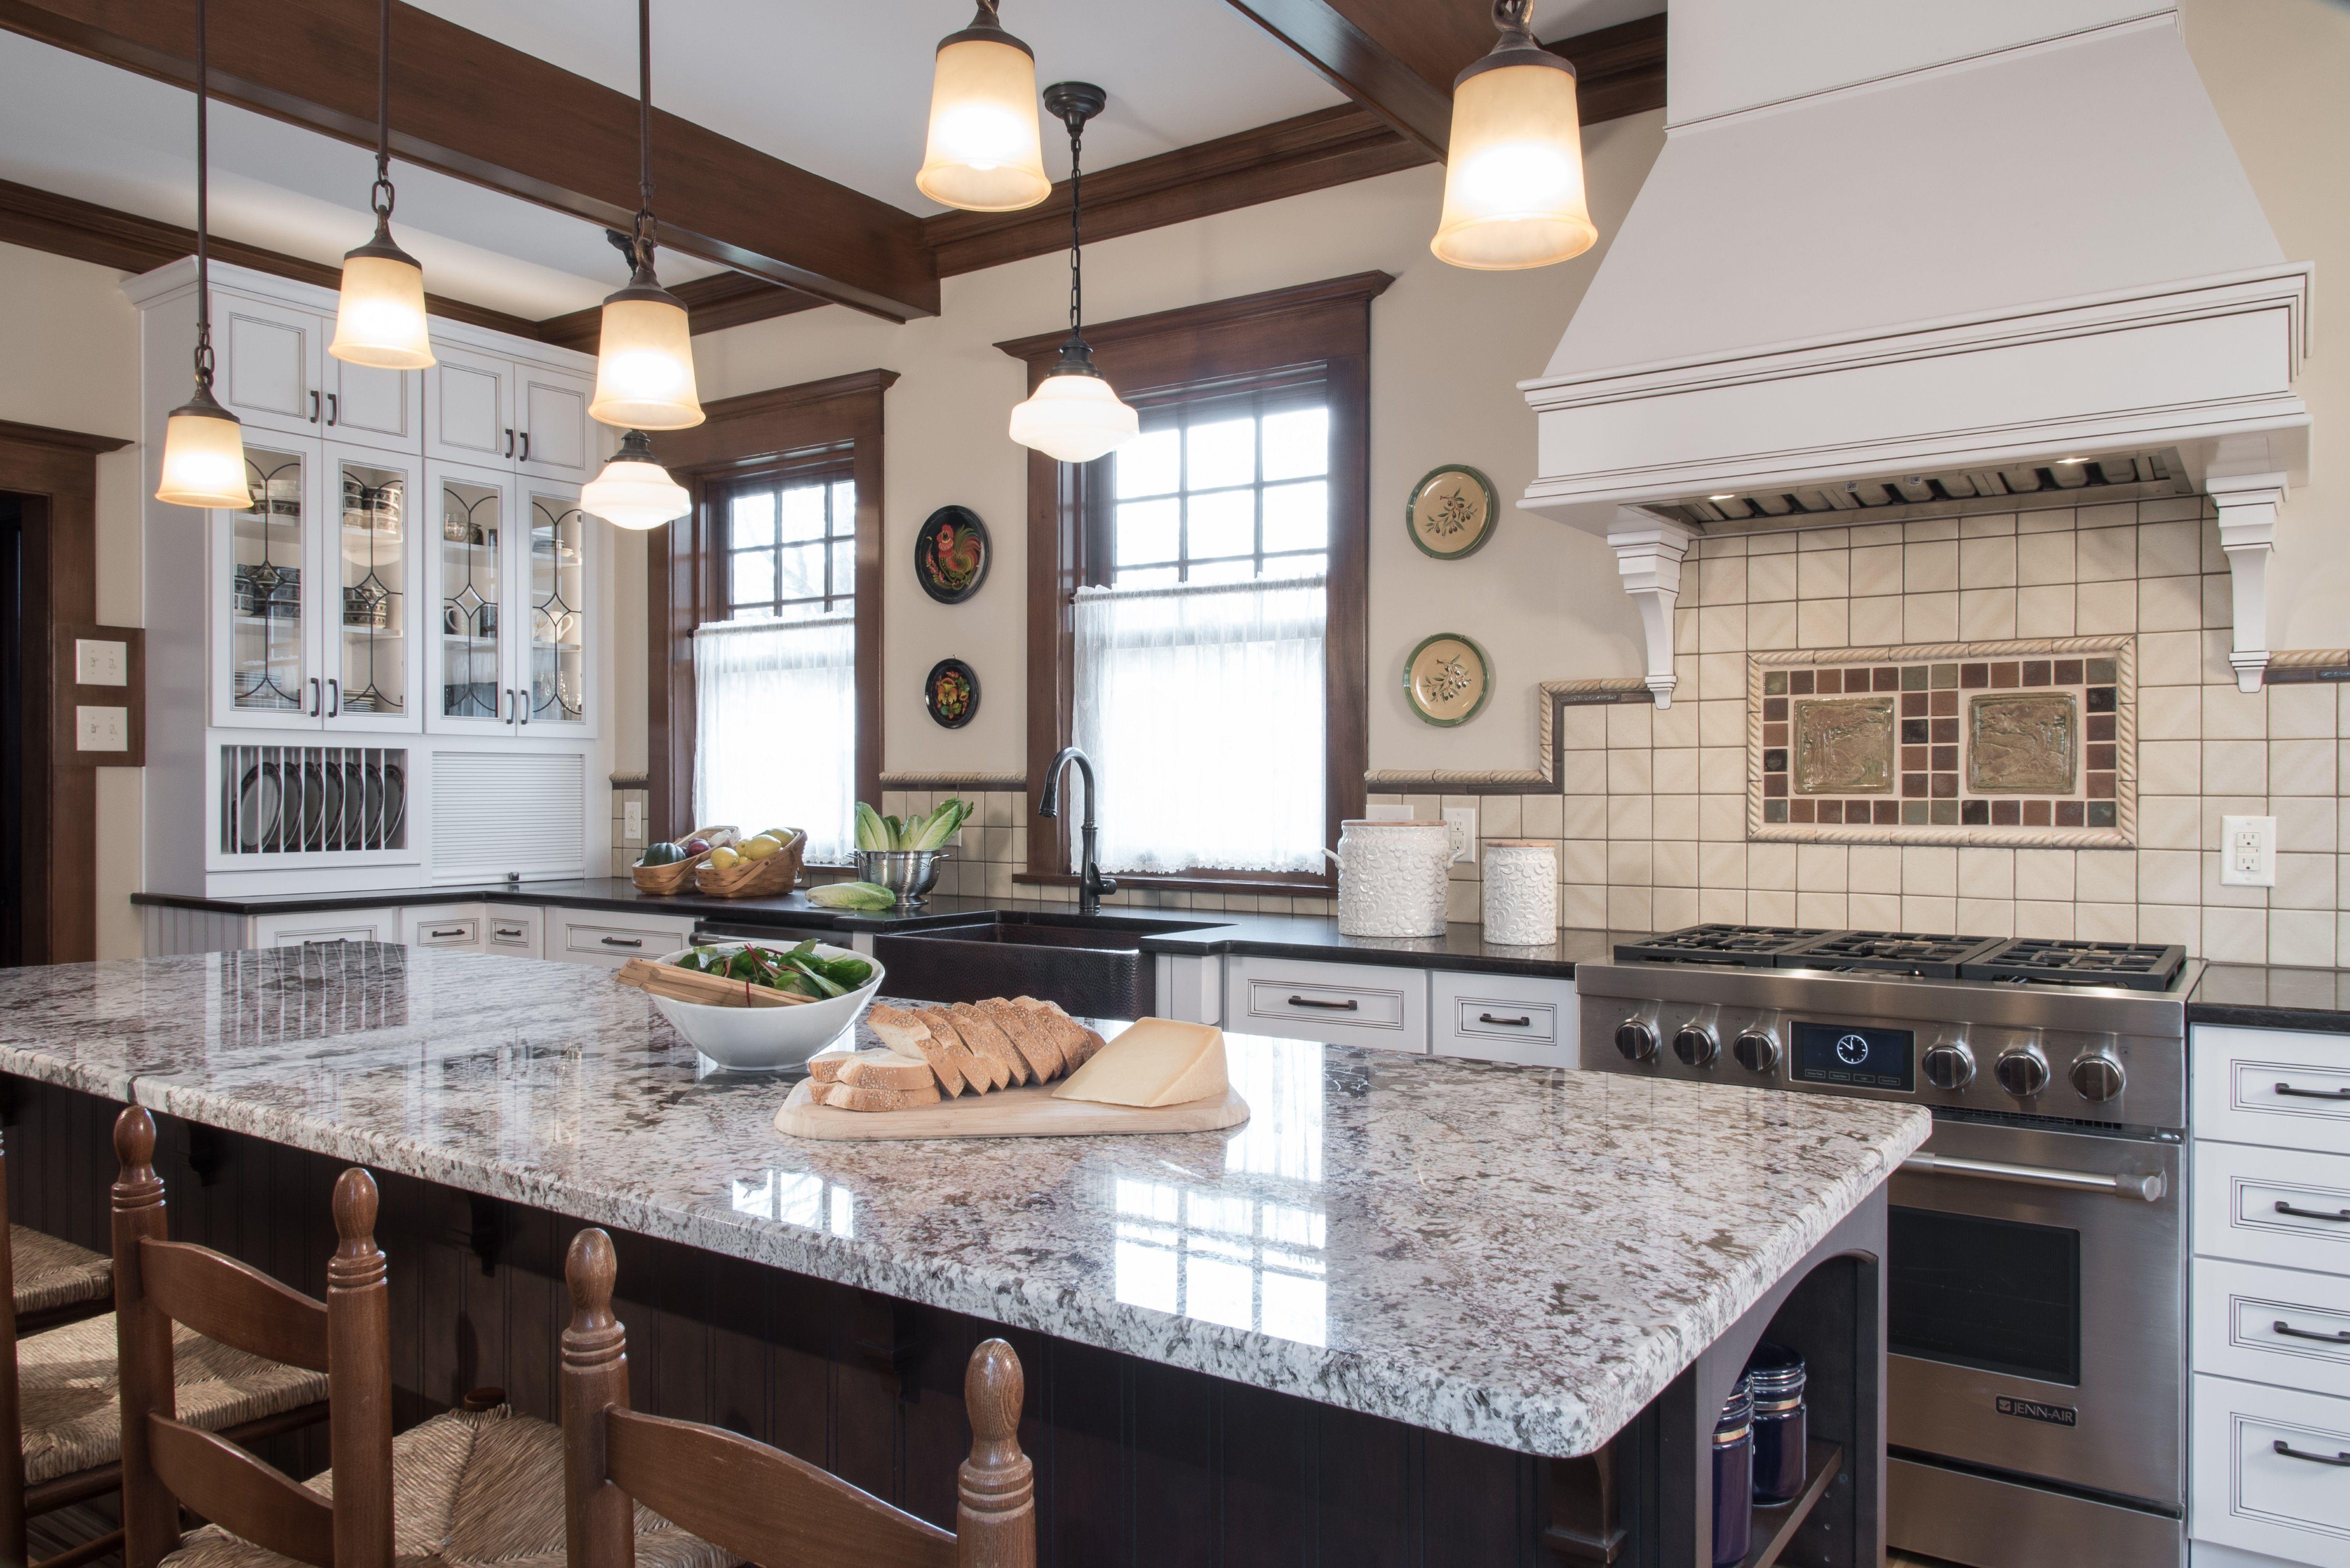 Mcbride Kitchen From Designer Hollie Cunningham Kitchen Inspiration Design Kitchen Kitchen Renovation